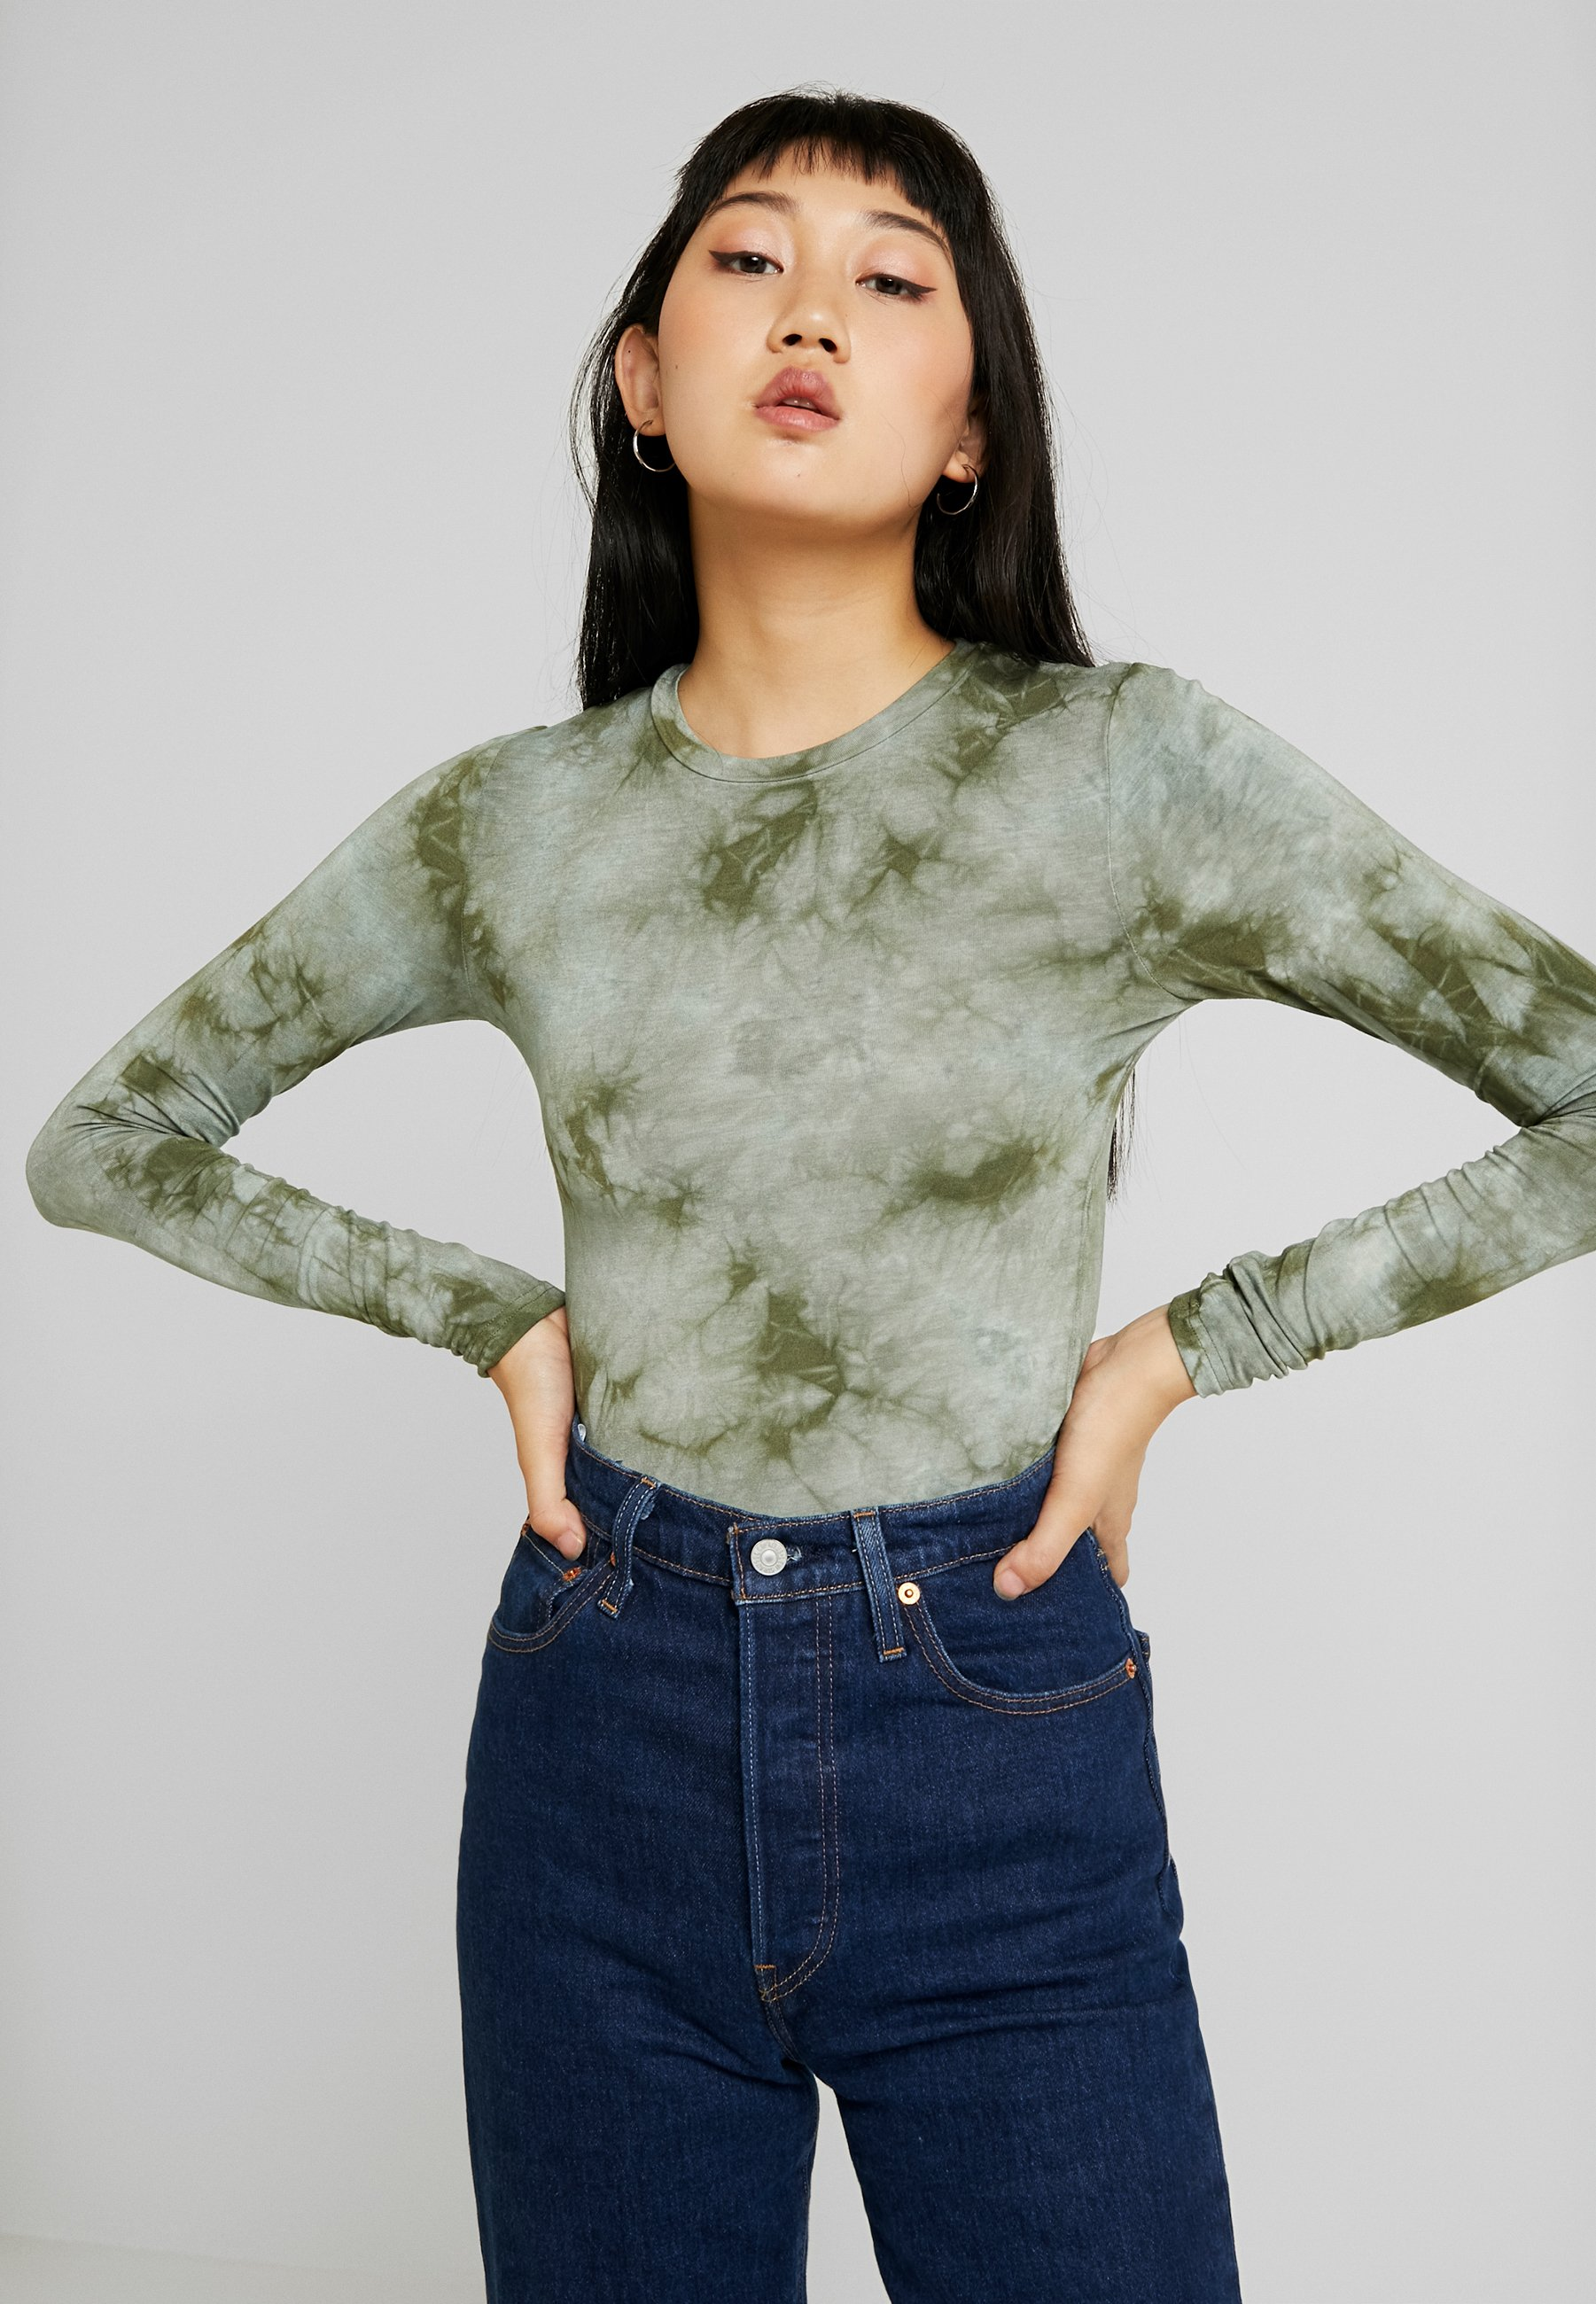 Dye EnrattvikT Manches Longues Olive Envii shirt Tie À zMqpSVU